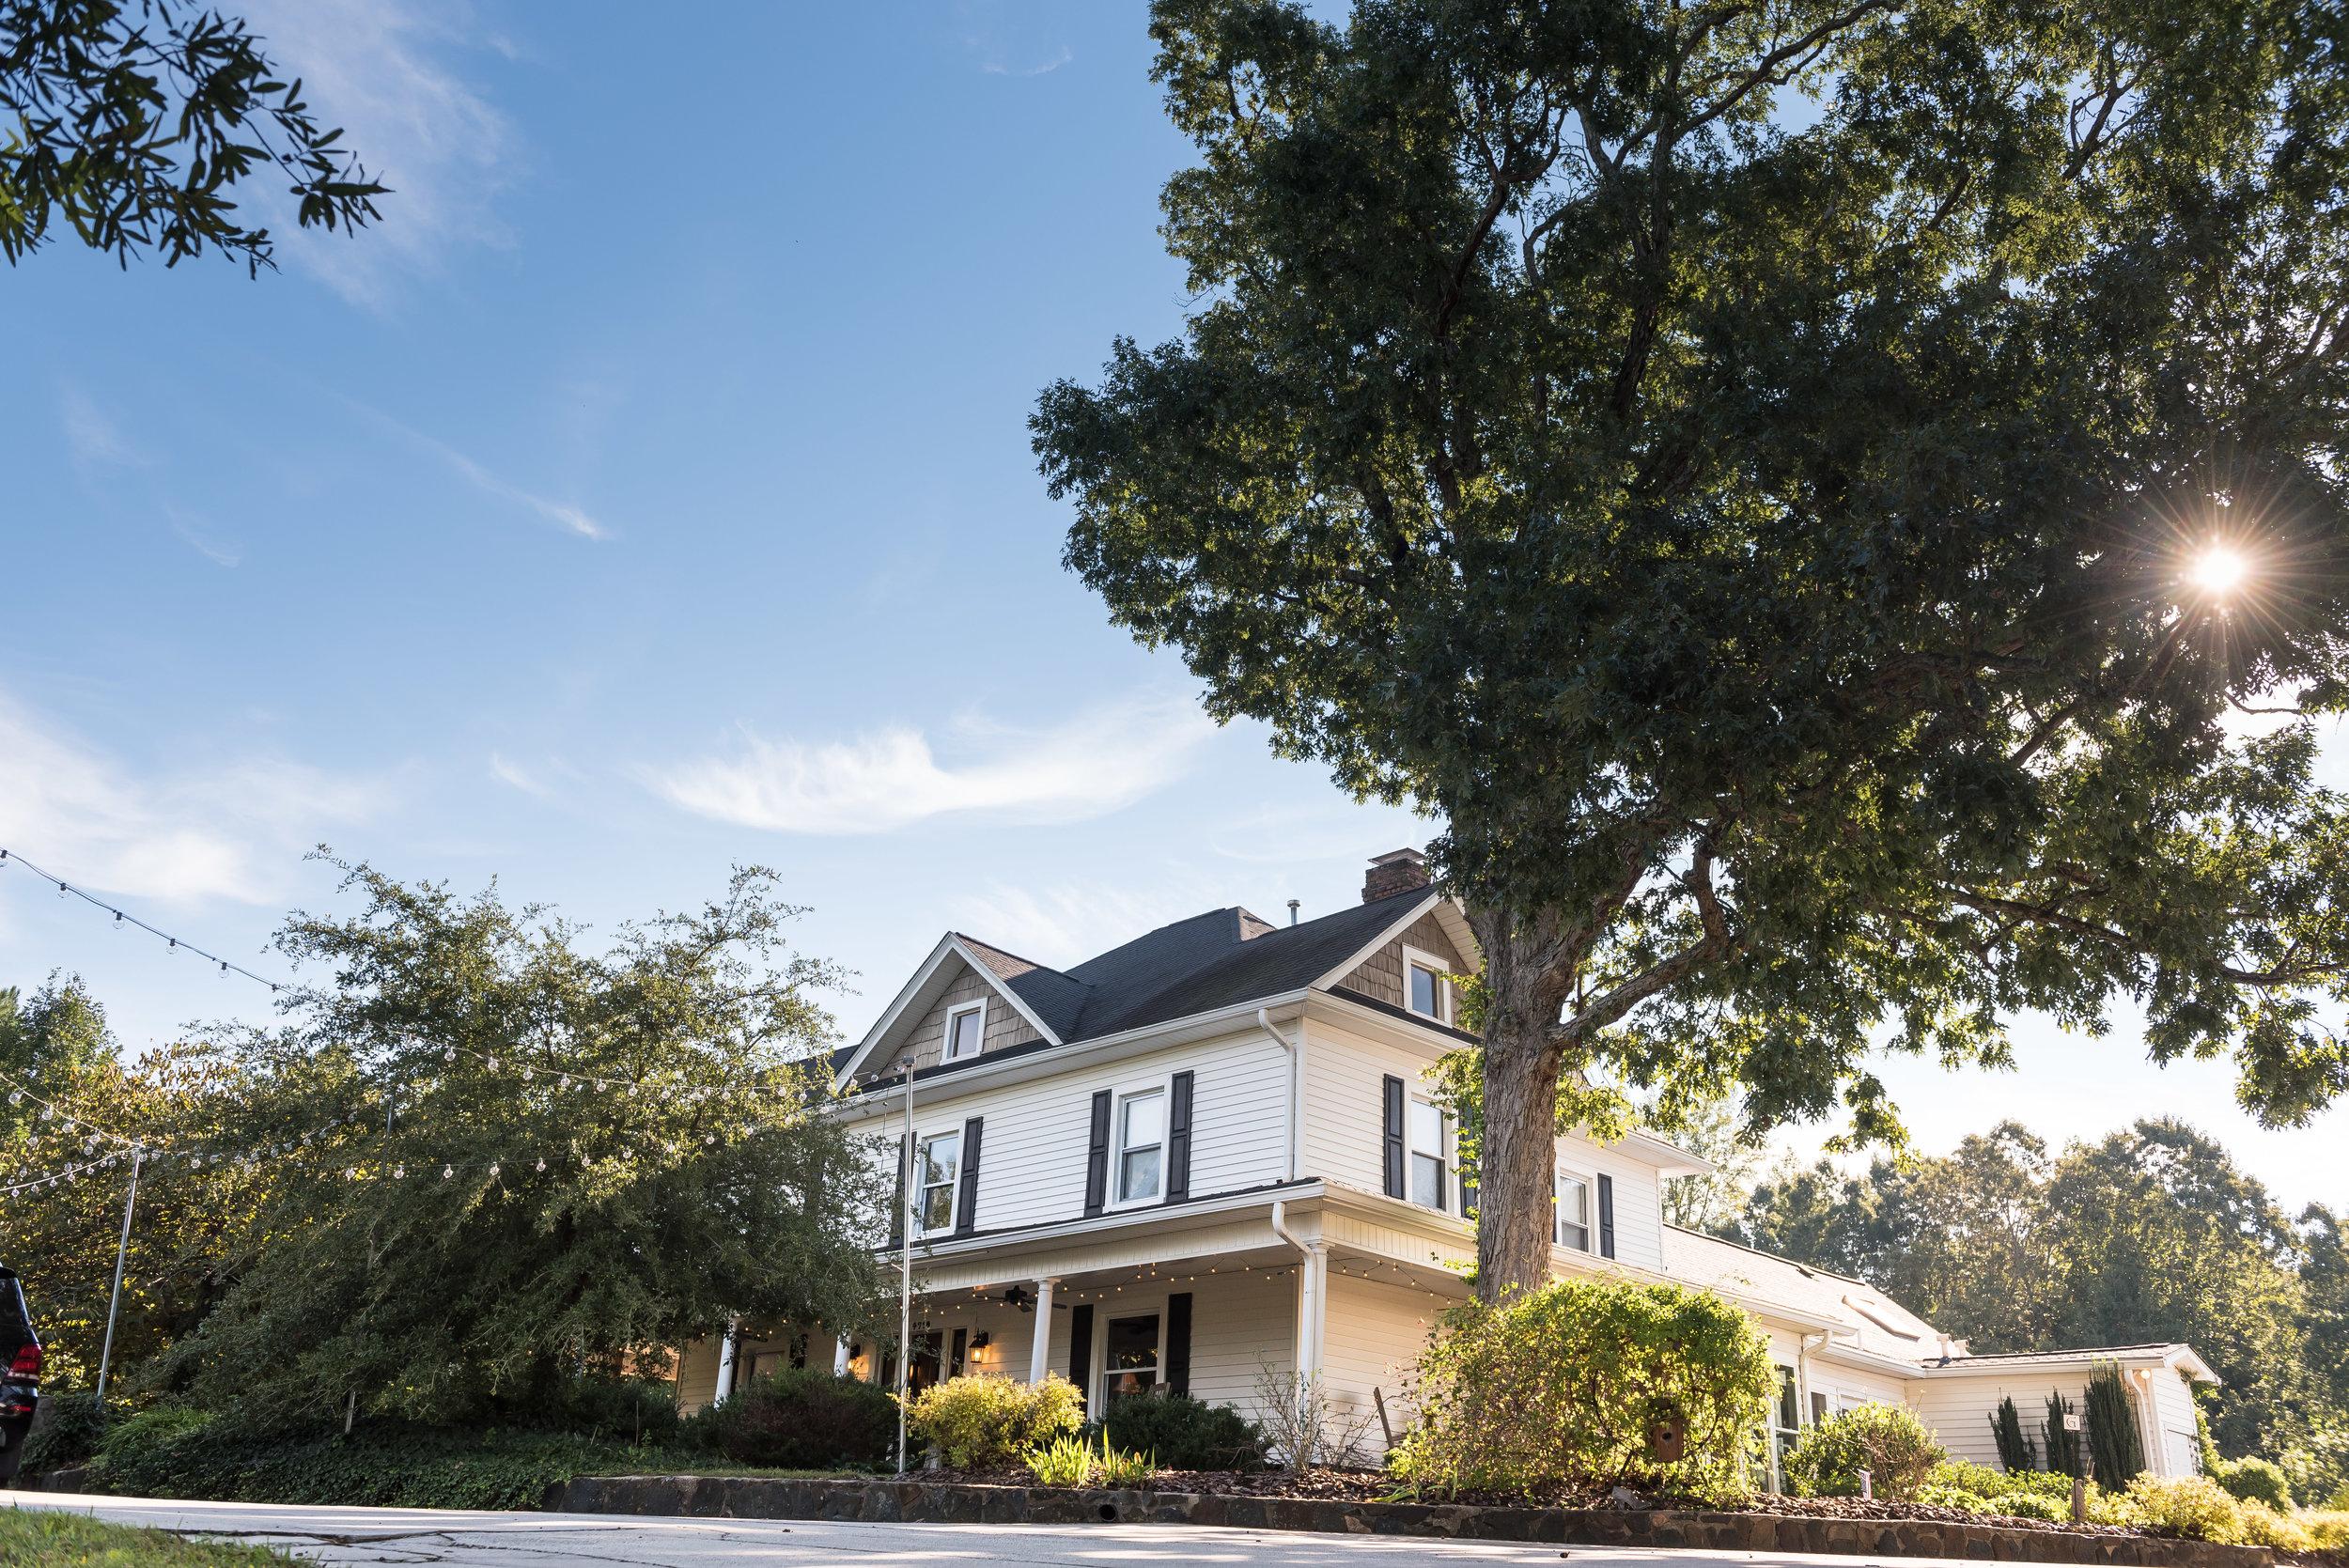 The Groome Inn - Greensboro NC - Best Wedding Venue in Piedmont Triad